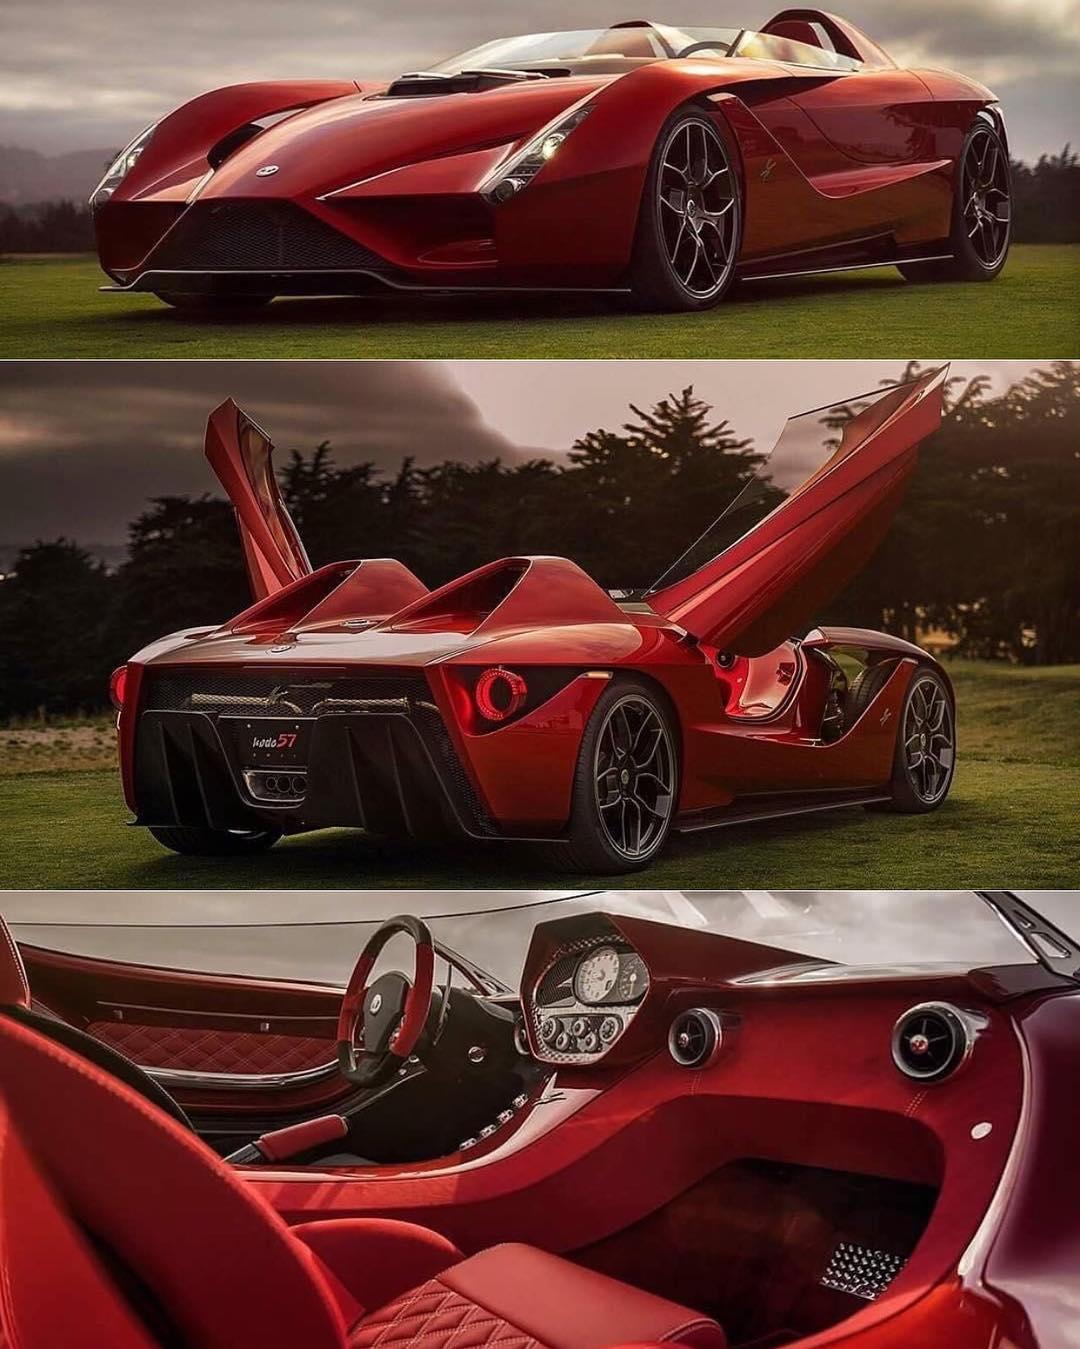 Okuyama Kode57 Enji: Lamborghini Urus, Un SUV Deportivo Y El Pick